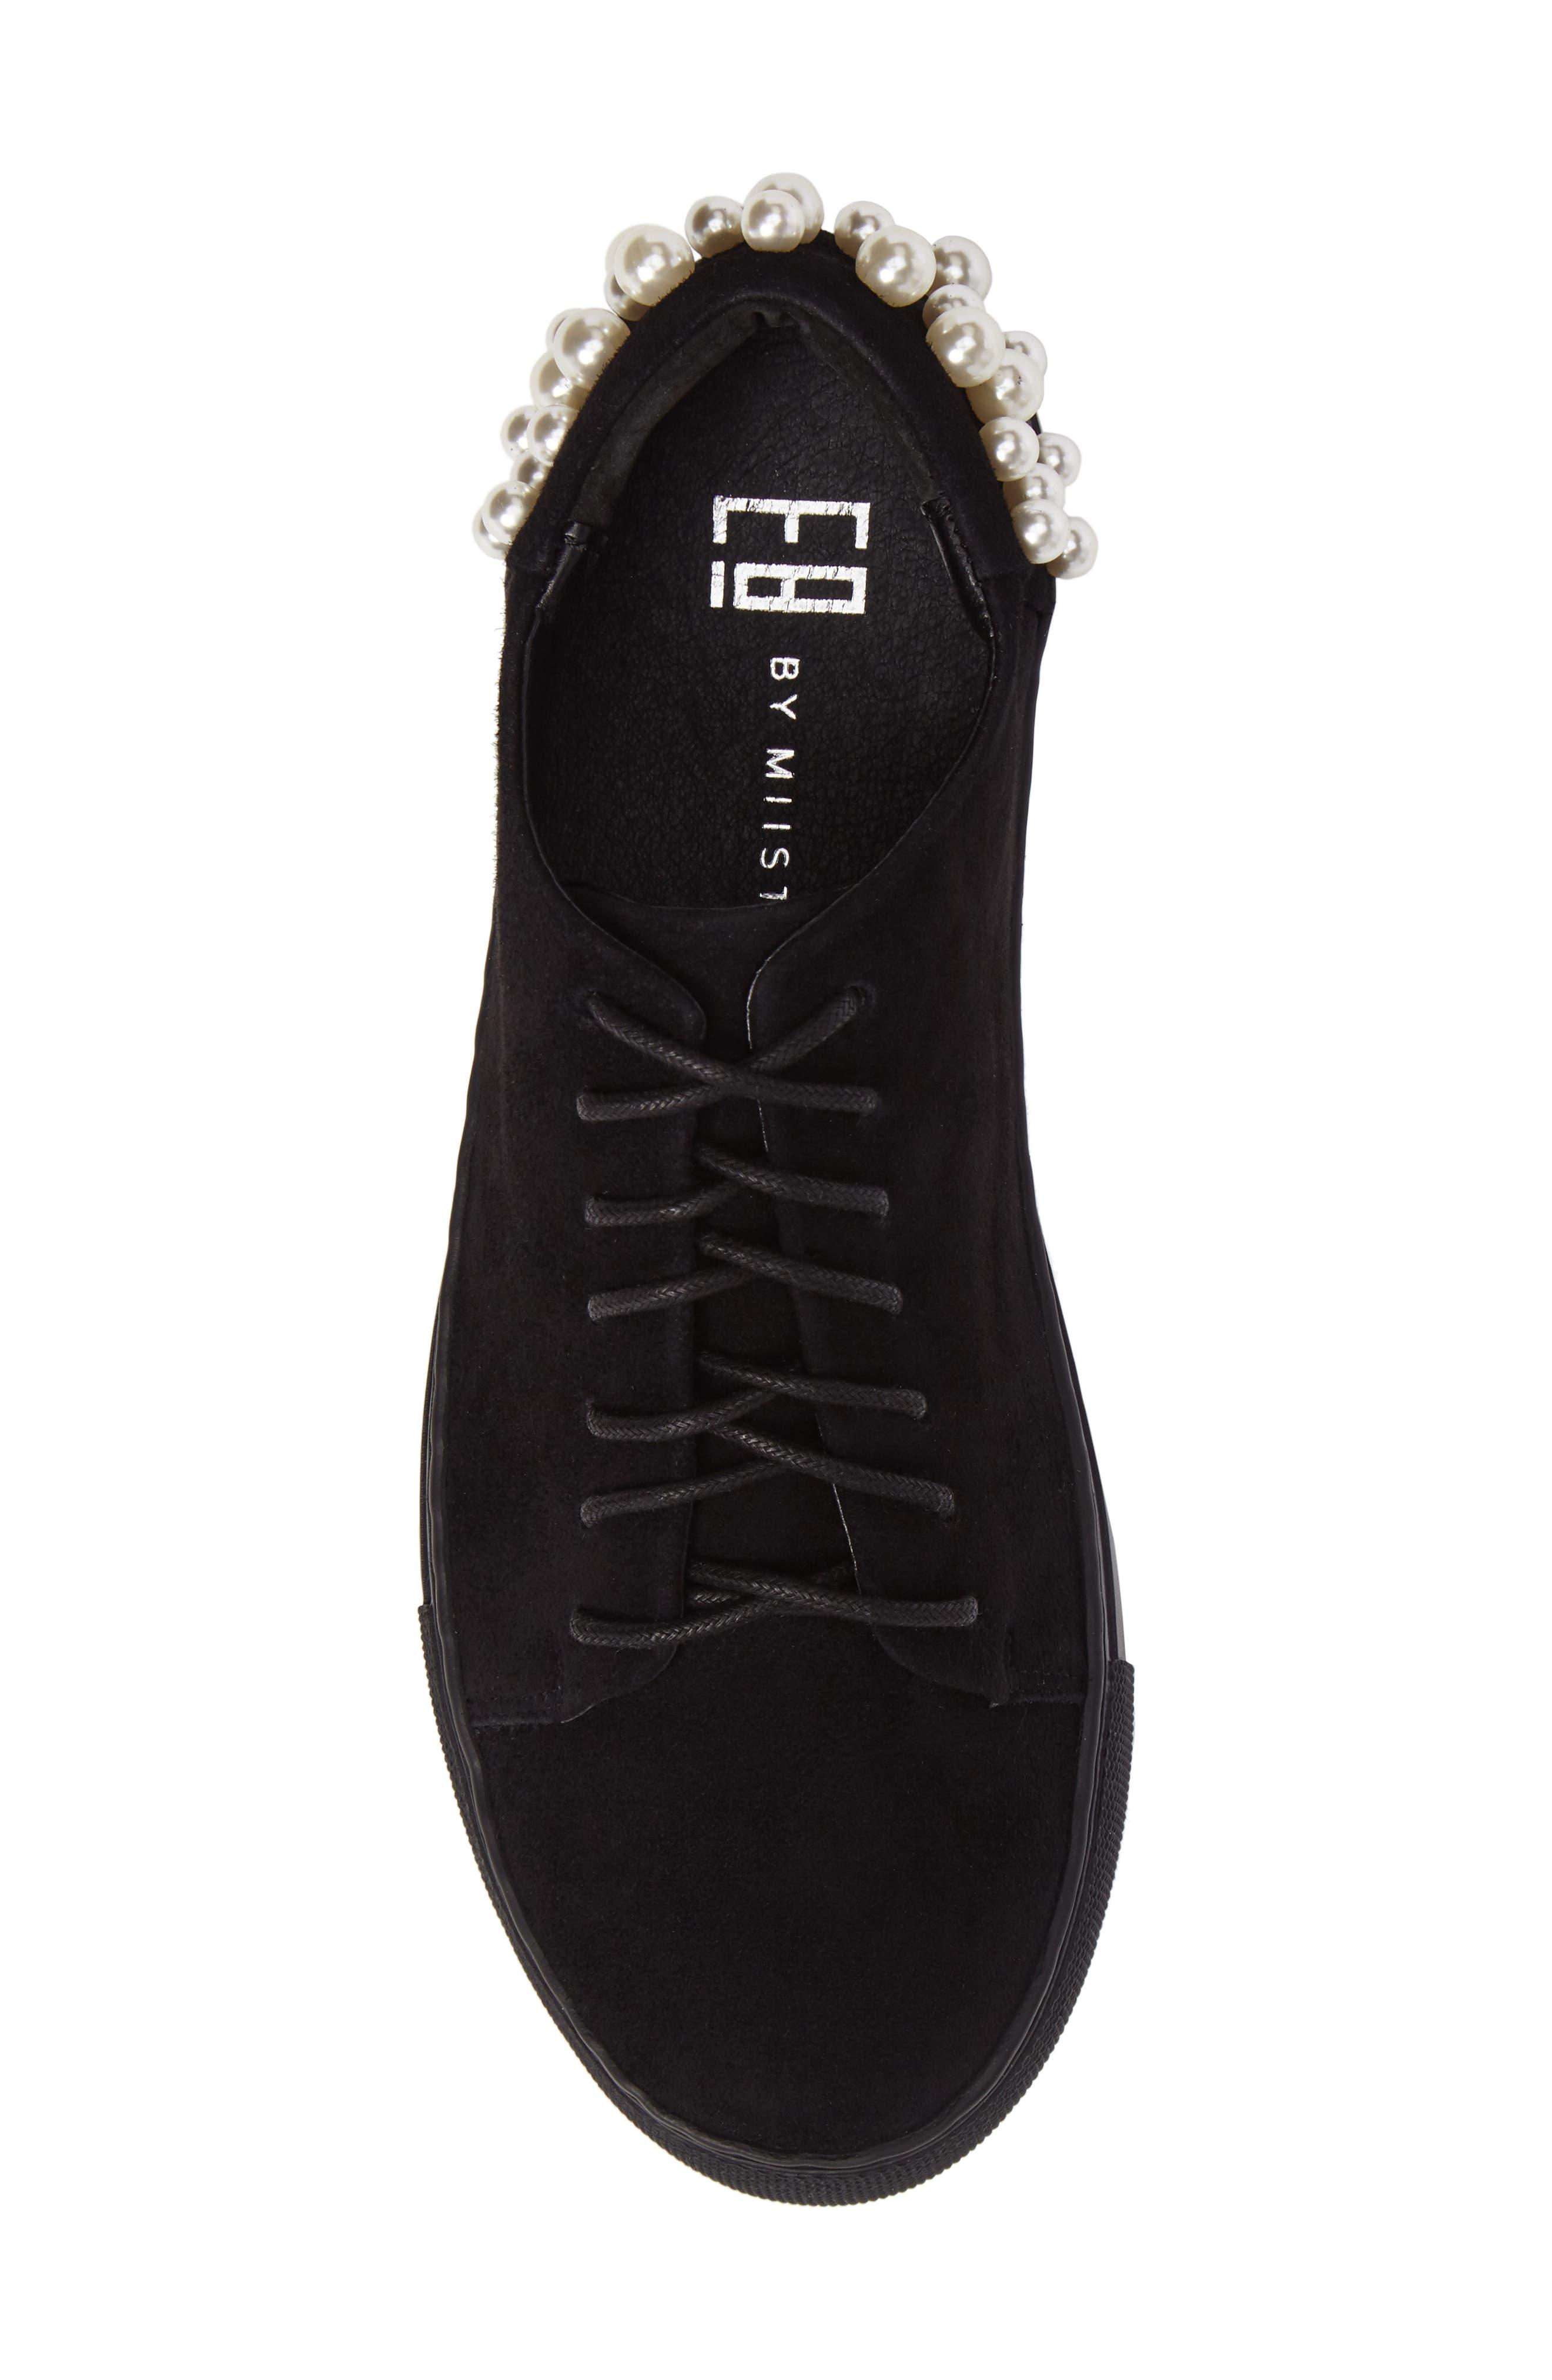 Haig Embellished Sneaker,                             Alternate thumbnail 5, color,                             001